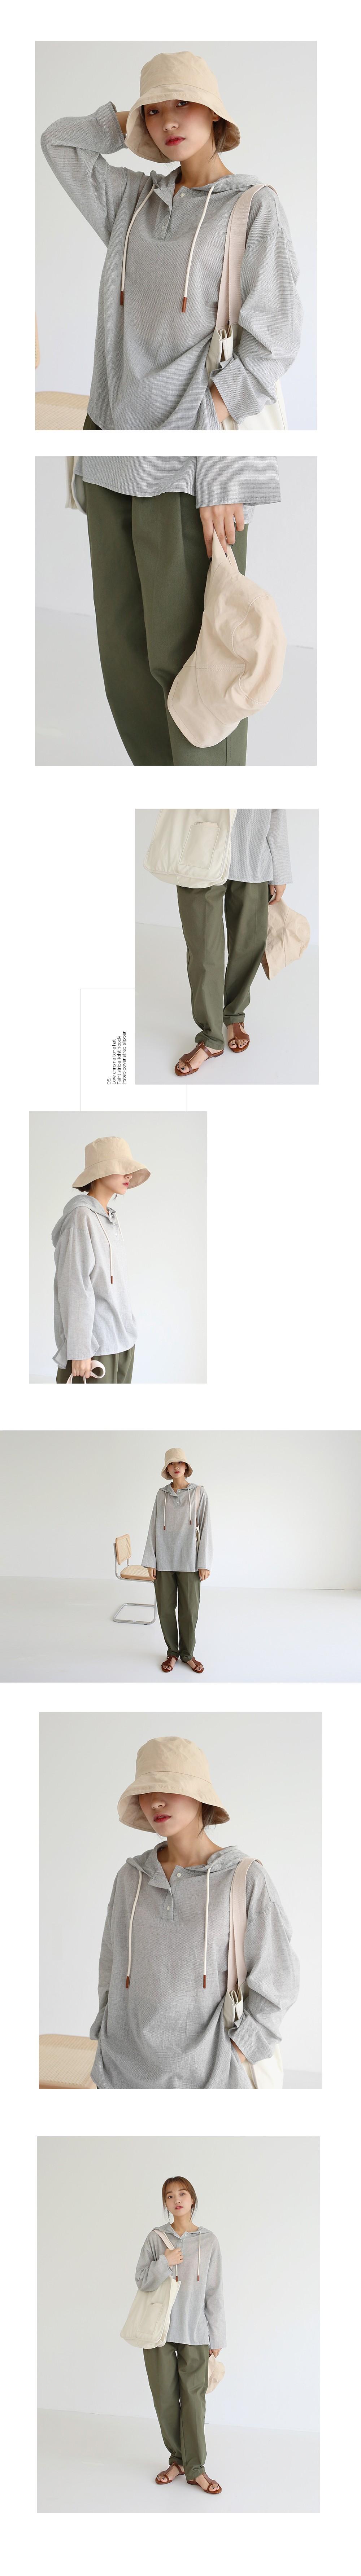 Low chroma tone hat